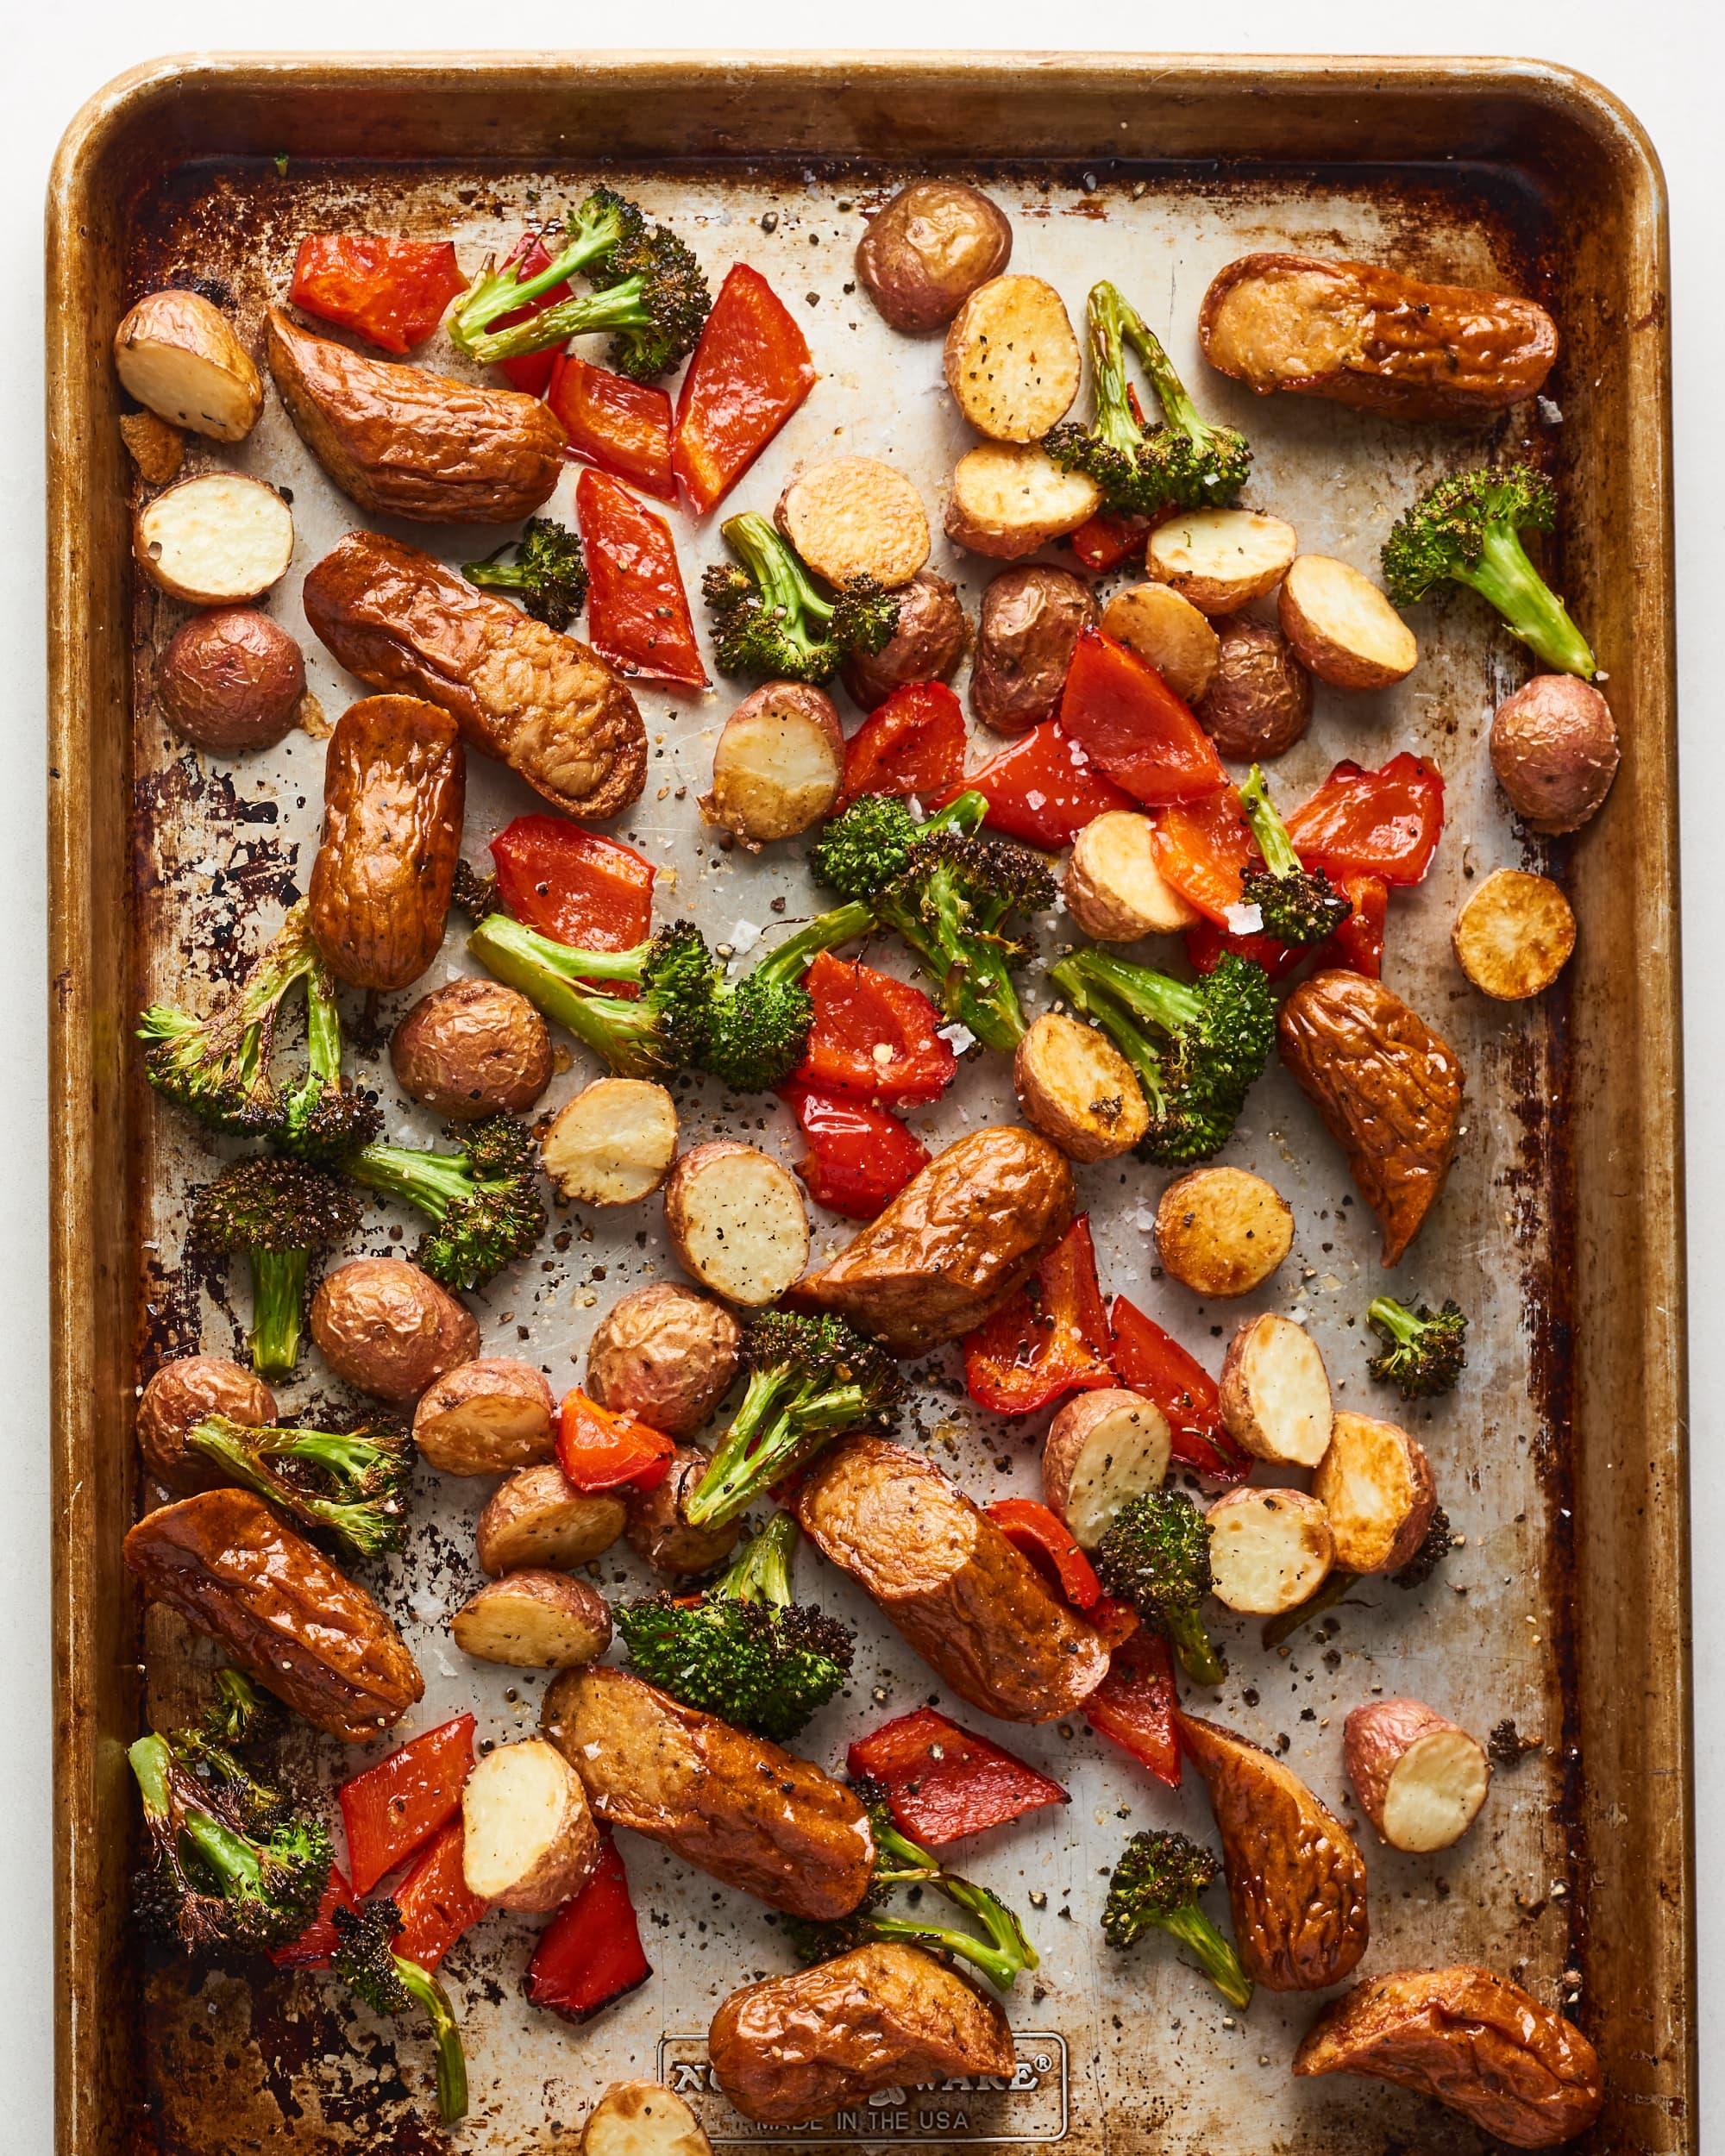 Recipe: Sheet Pan Italian Sausage and Veggies